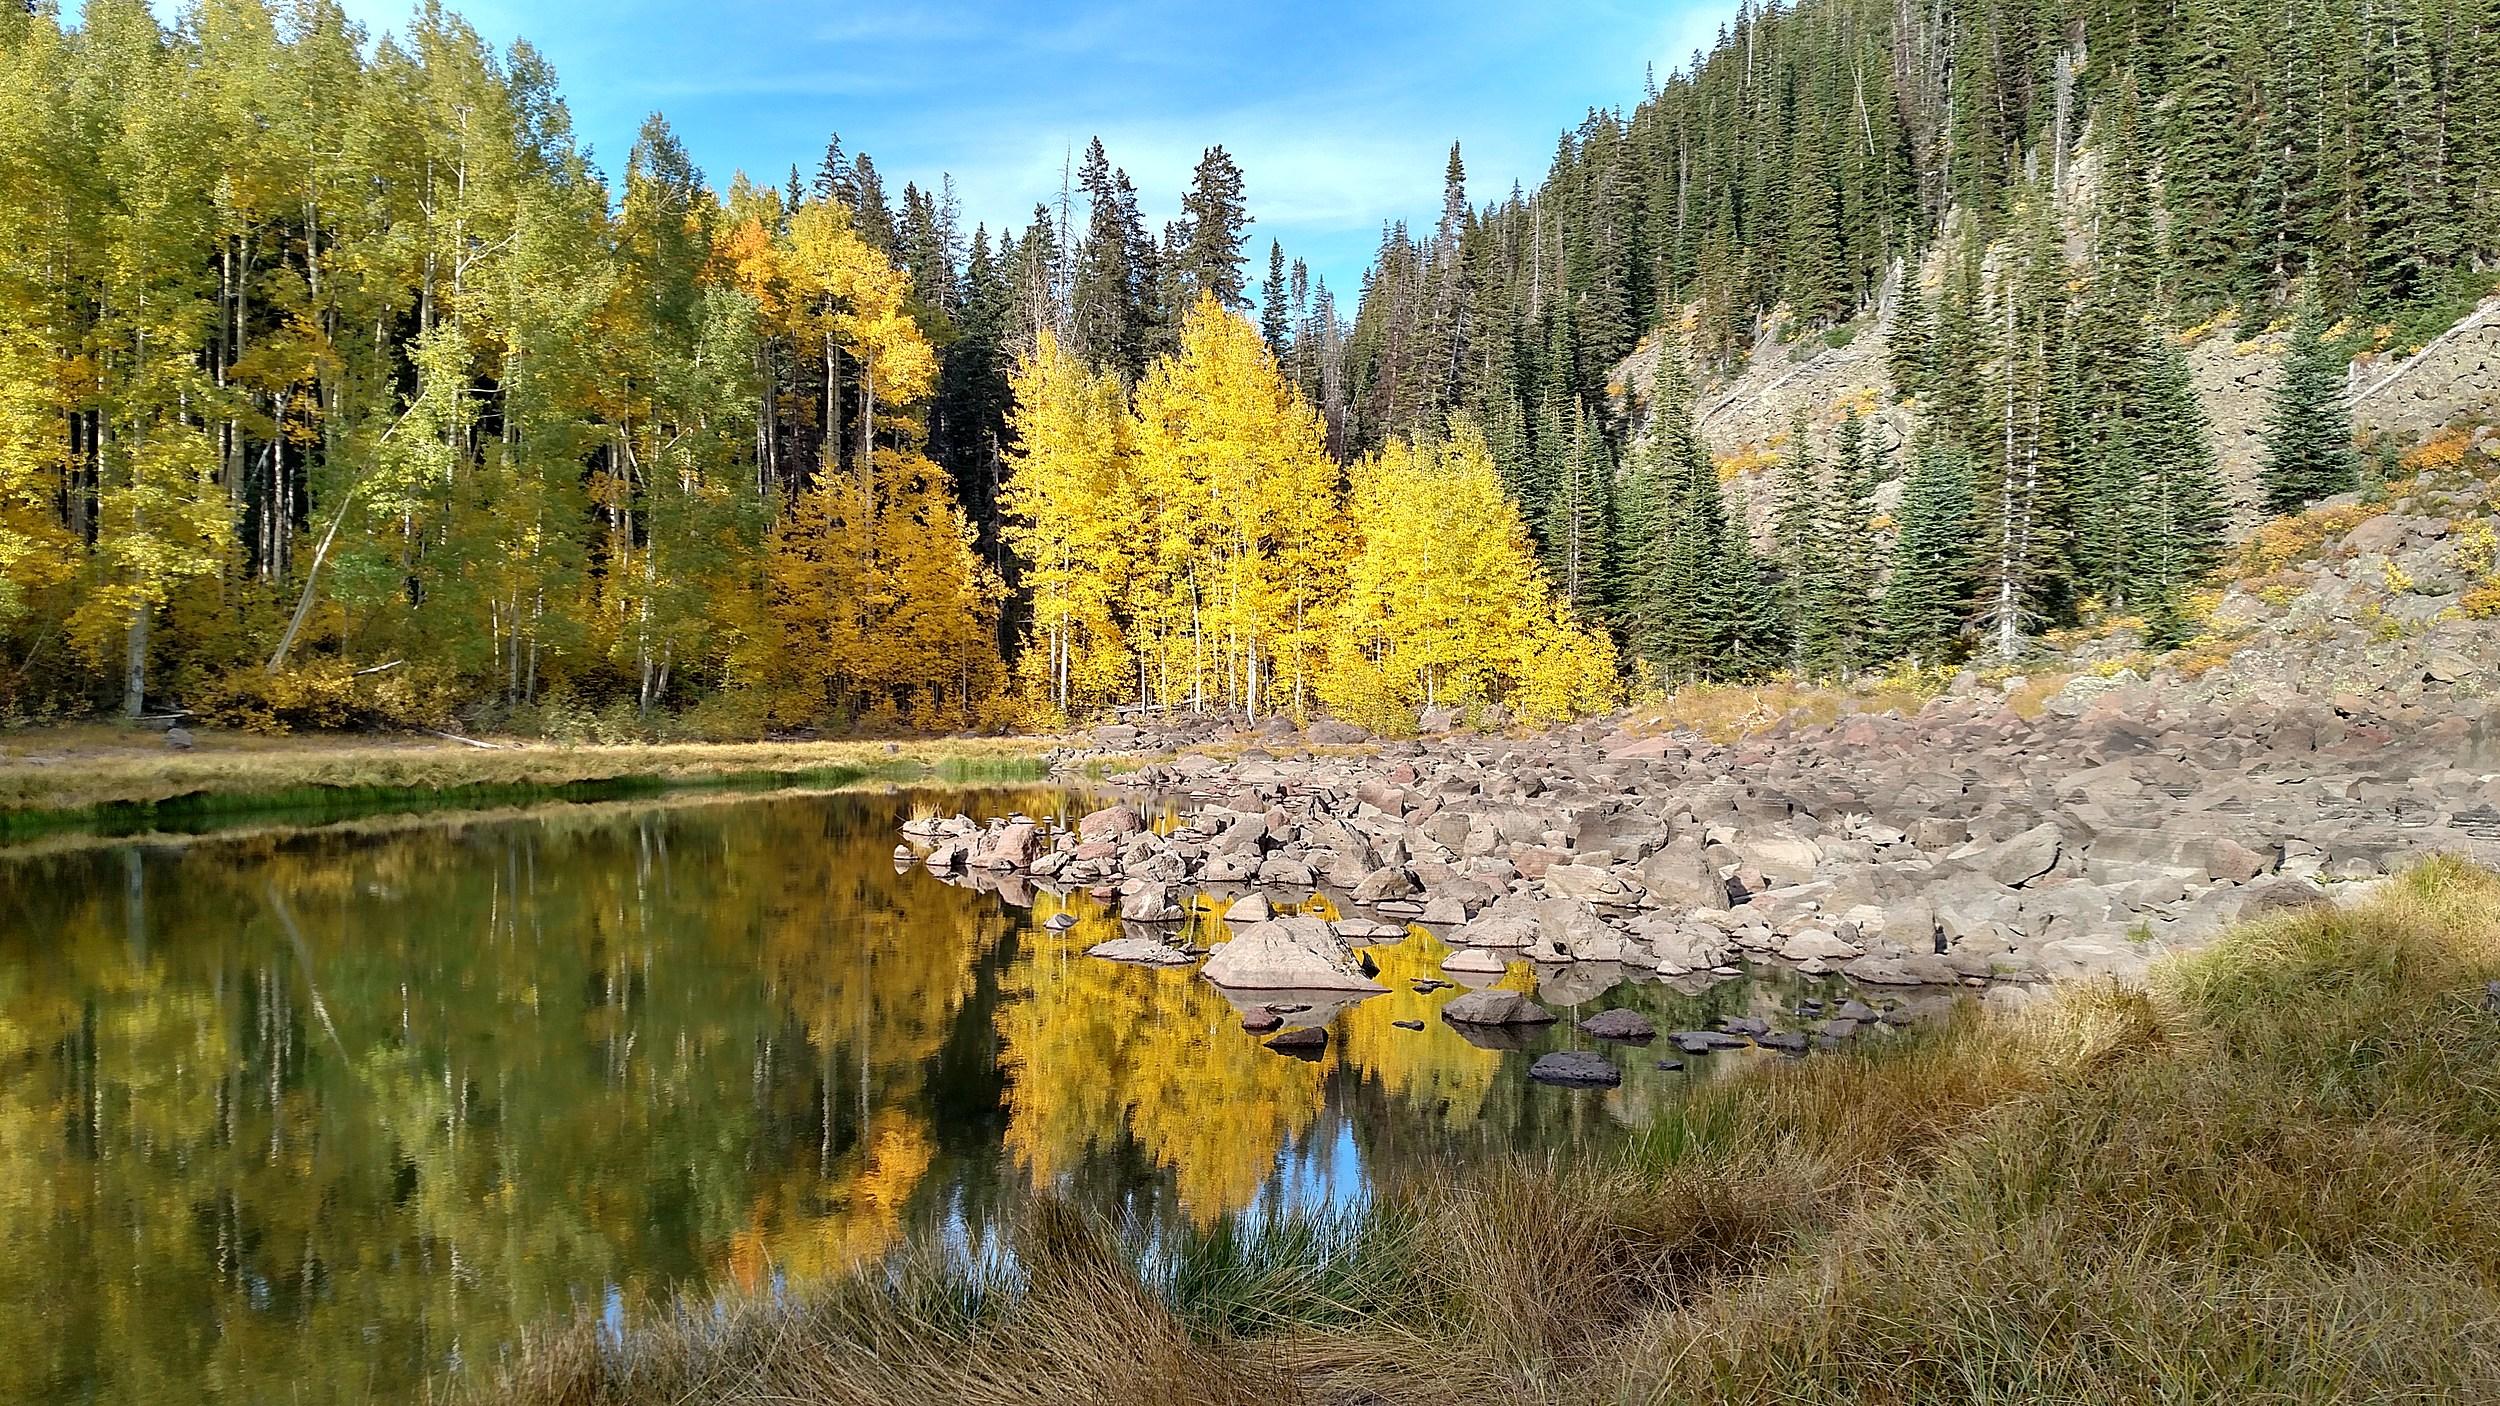 Grand Junction Picturesque Picnic Places